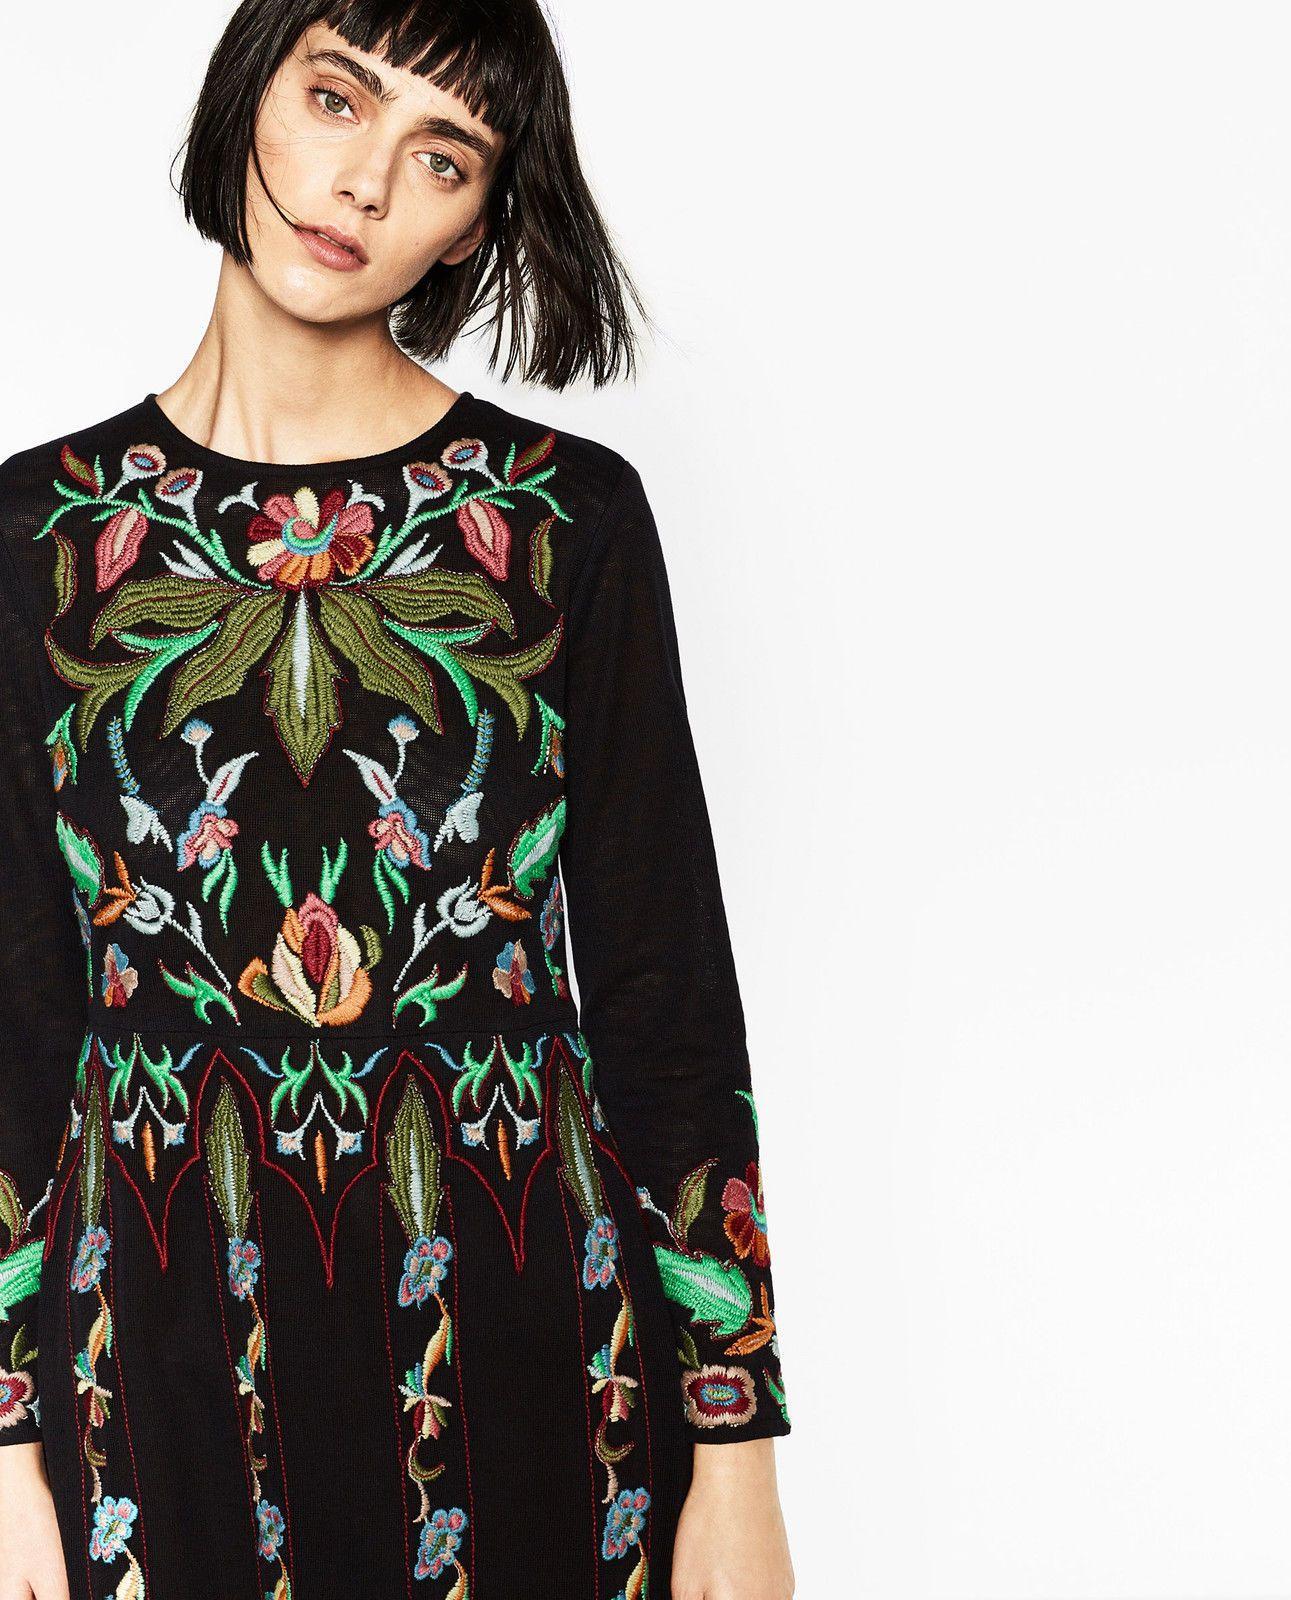 Spain Zara Floral Dresses Ebay 8d15a 0f411